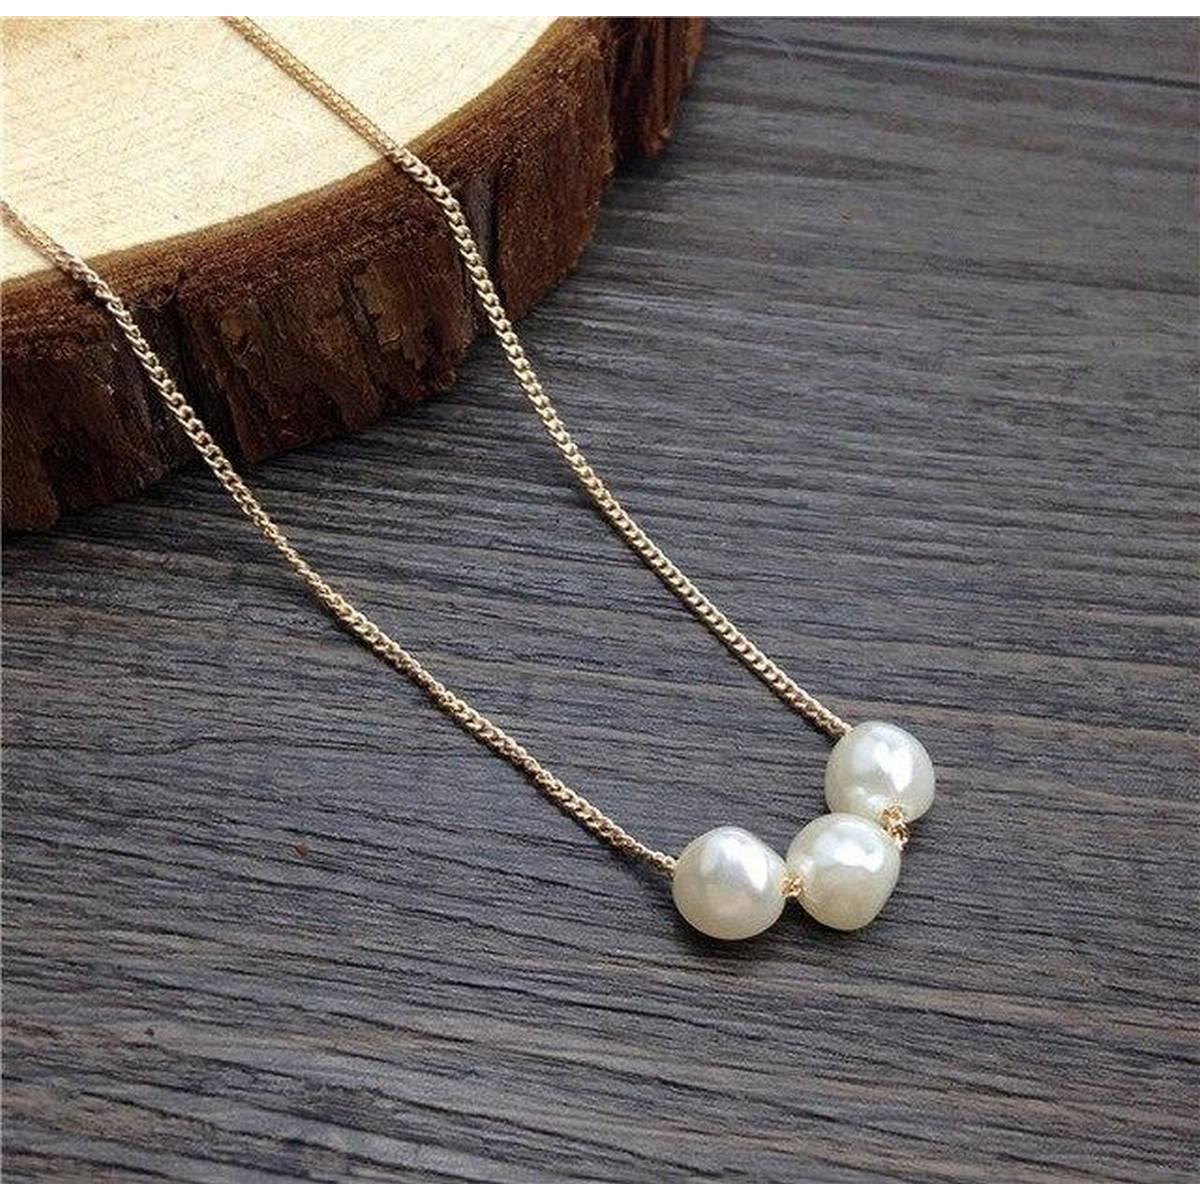 Elegant Three Pearl (Moti) Necklace/Locket/Pendant for Girls/Women